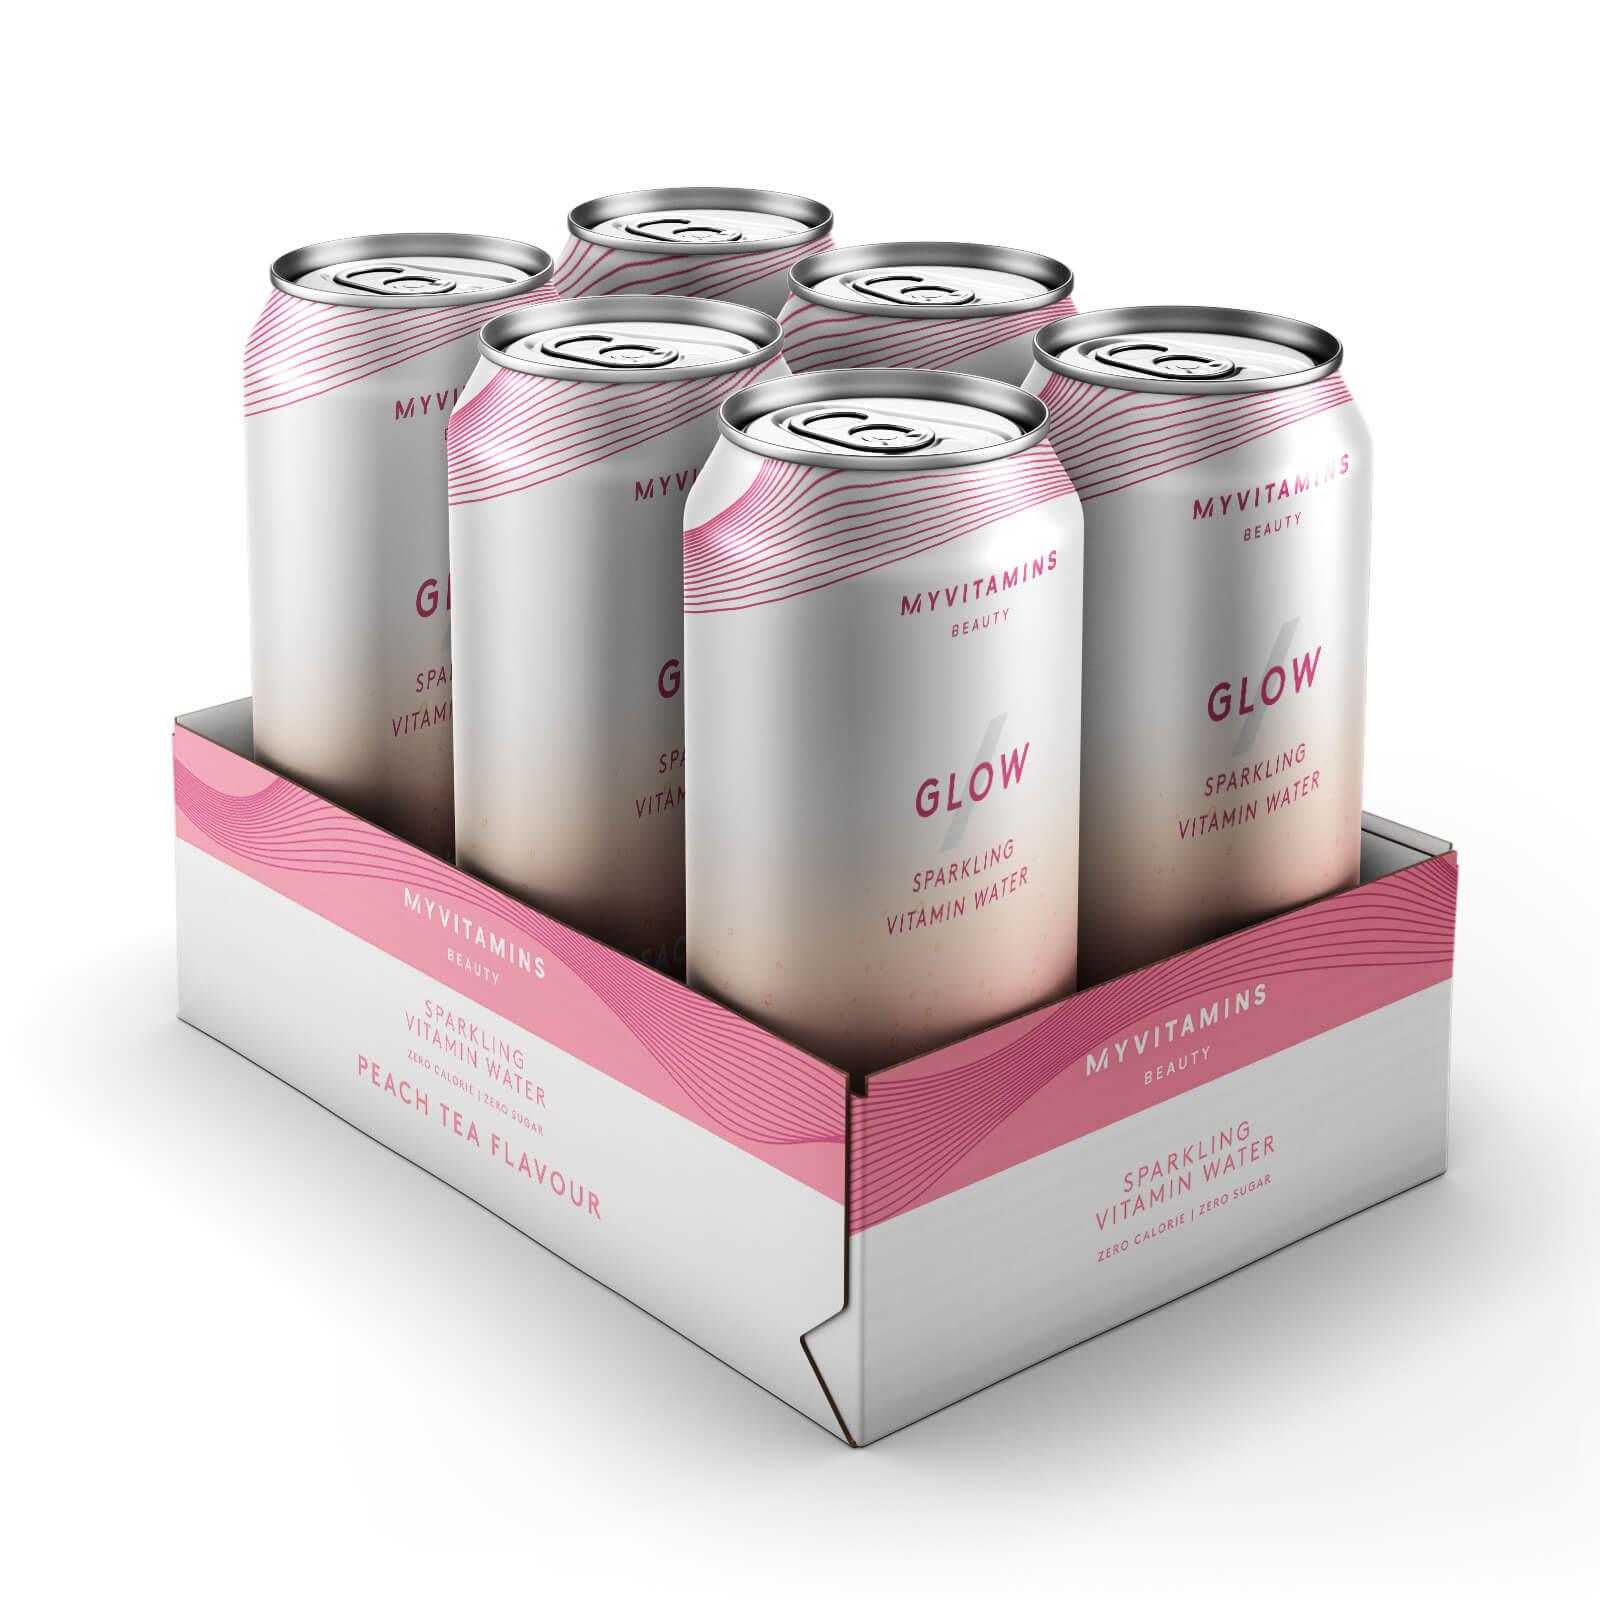 Vitamin Glow Beauty Drink - 6 x 330ml - Peach